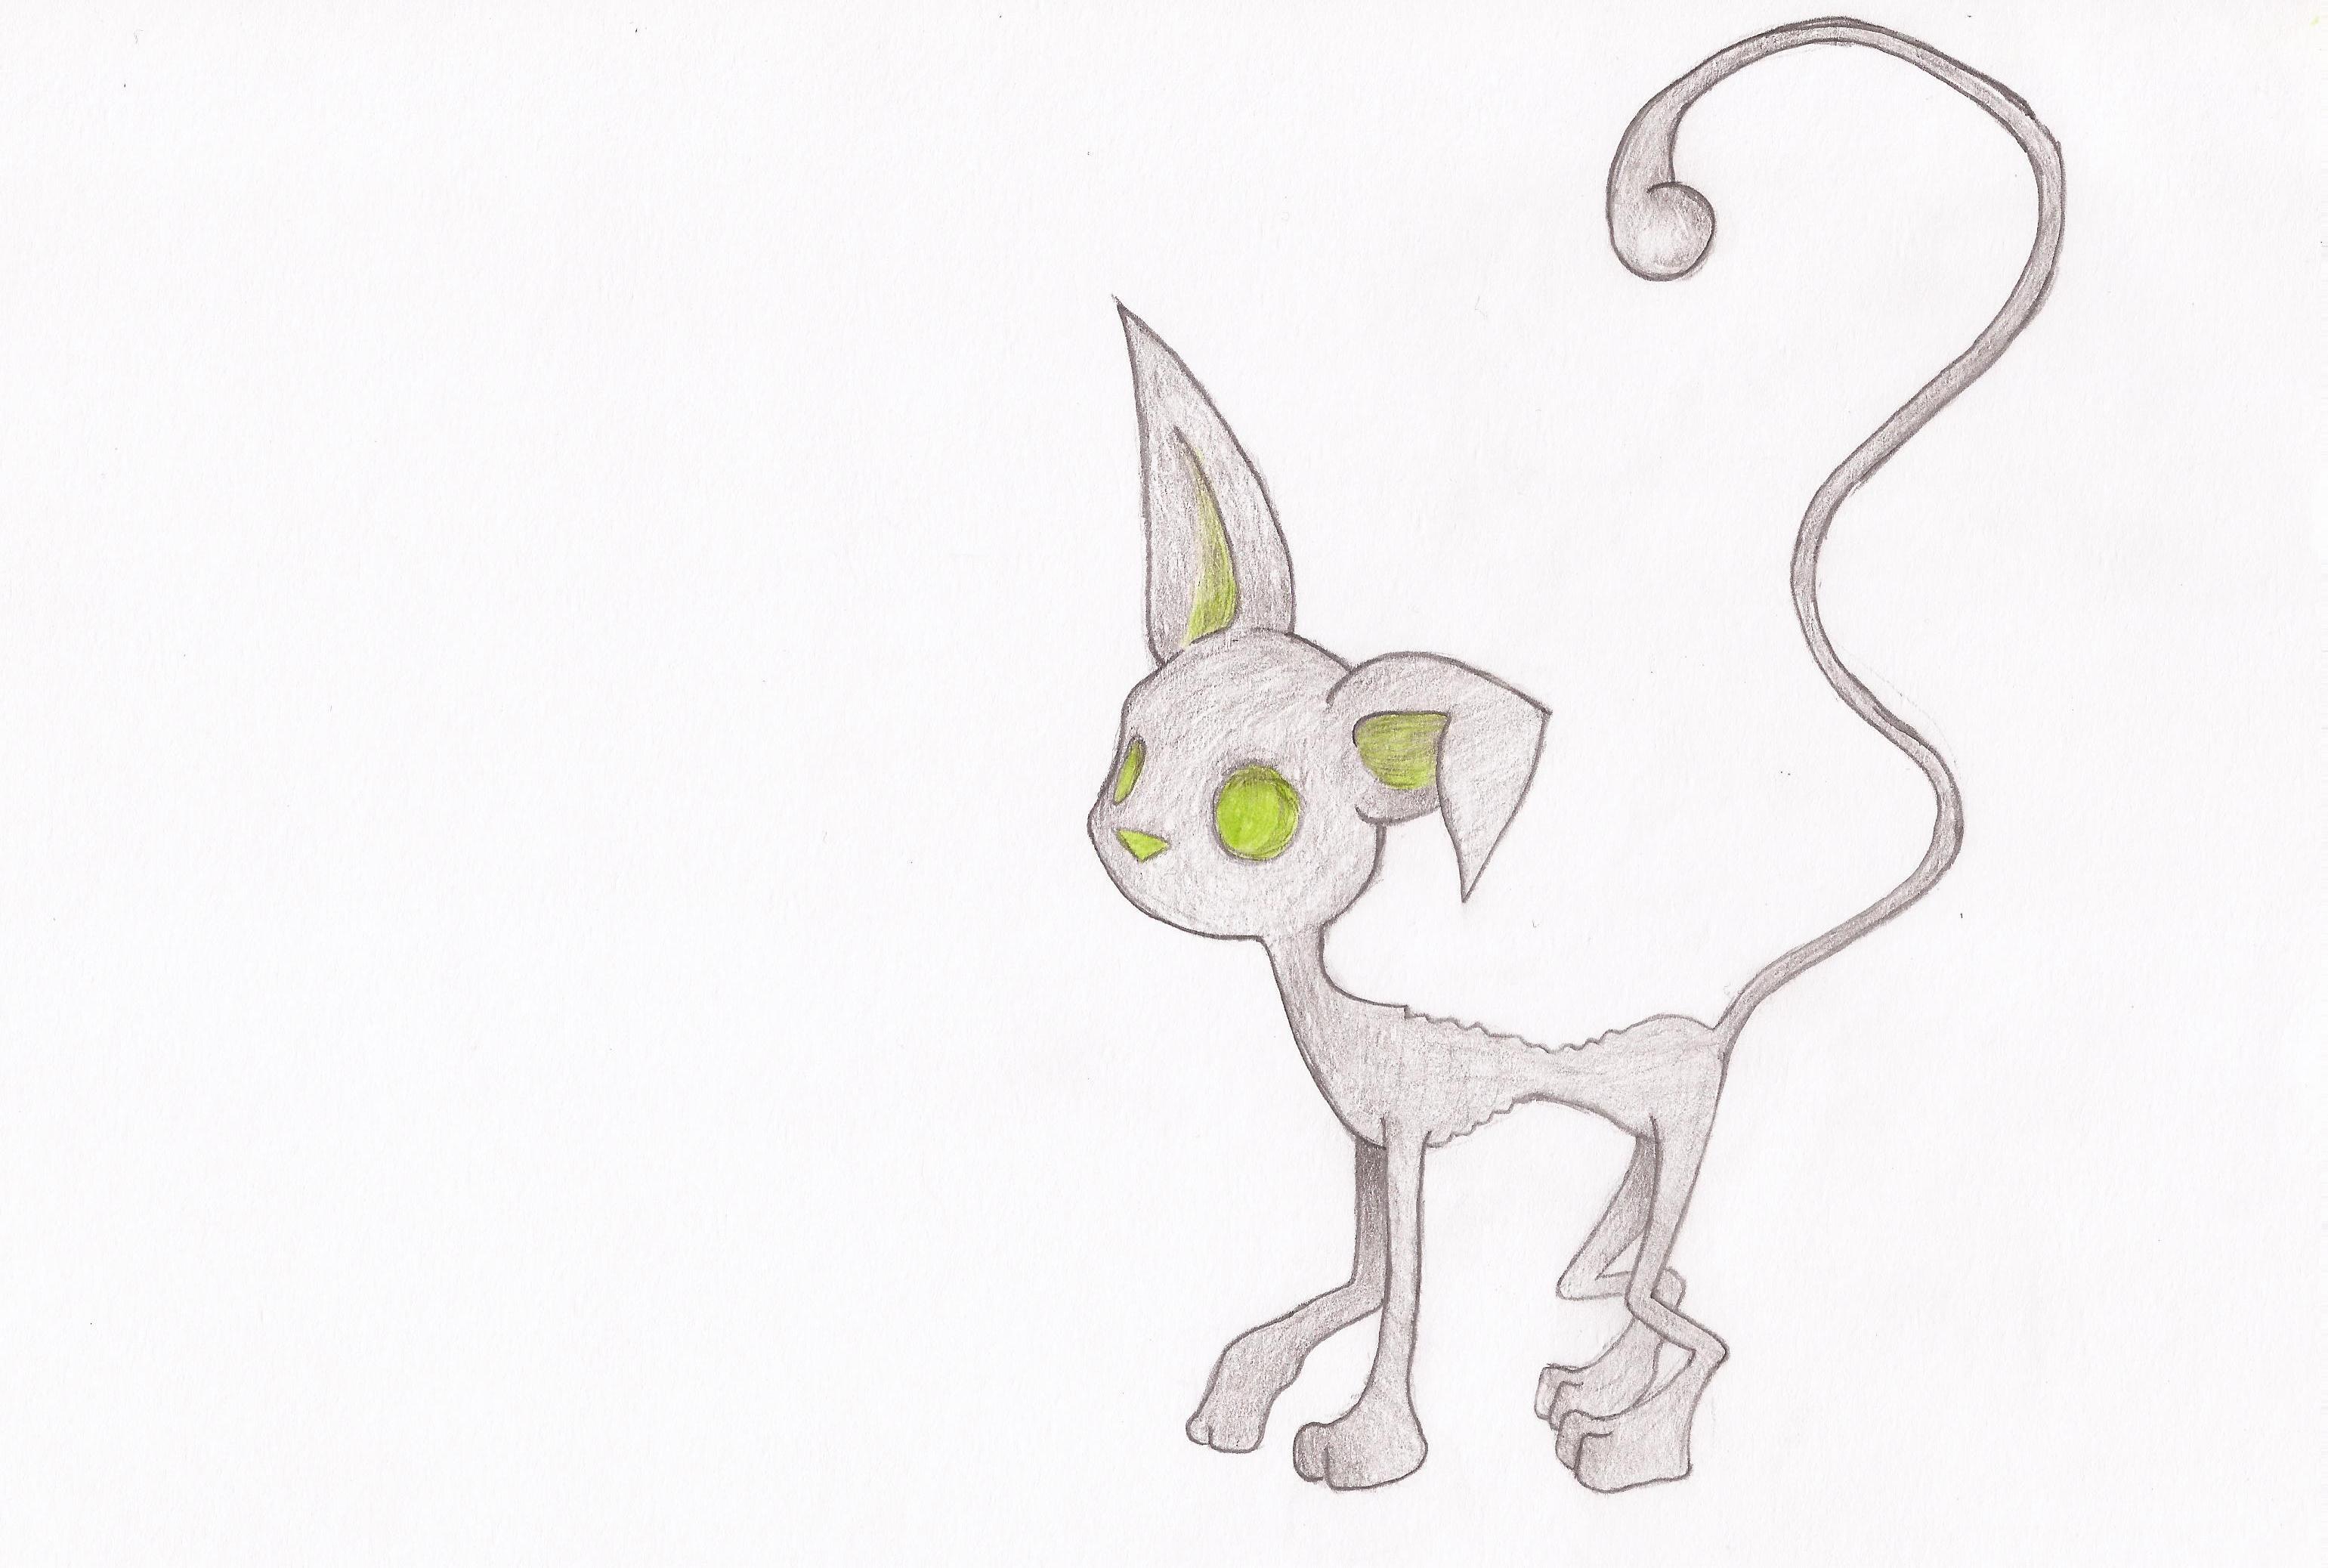 The Charquicat